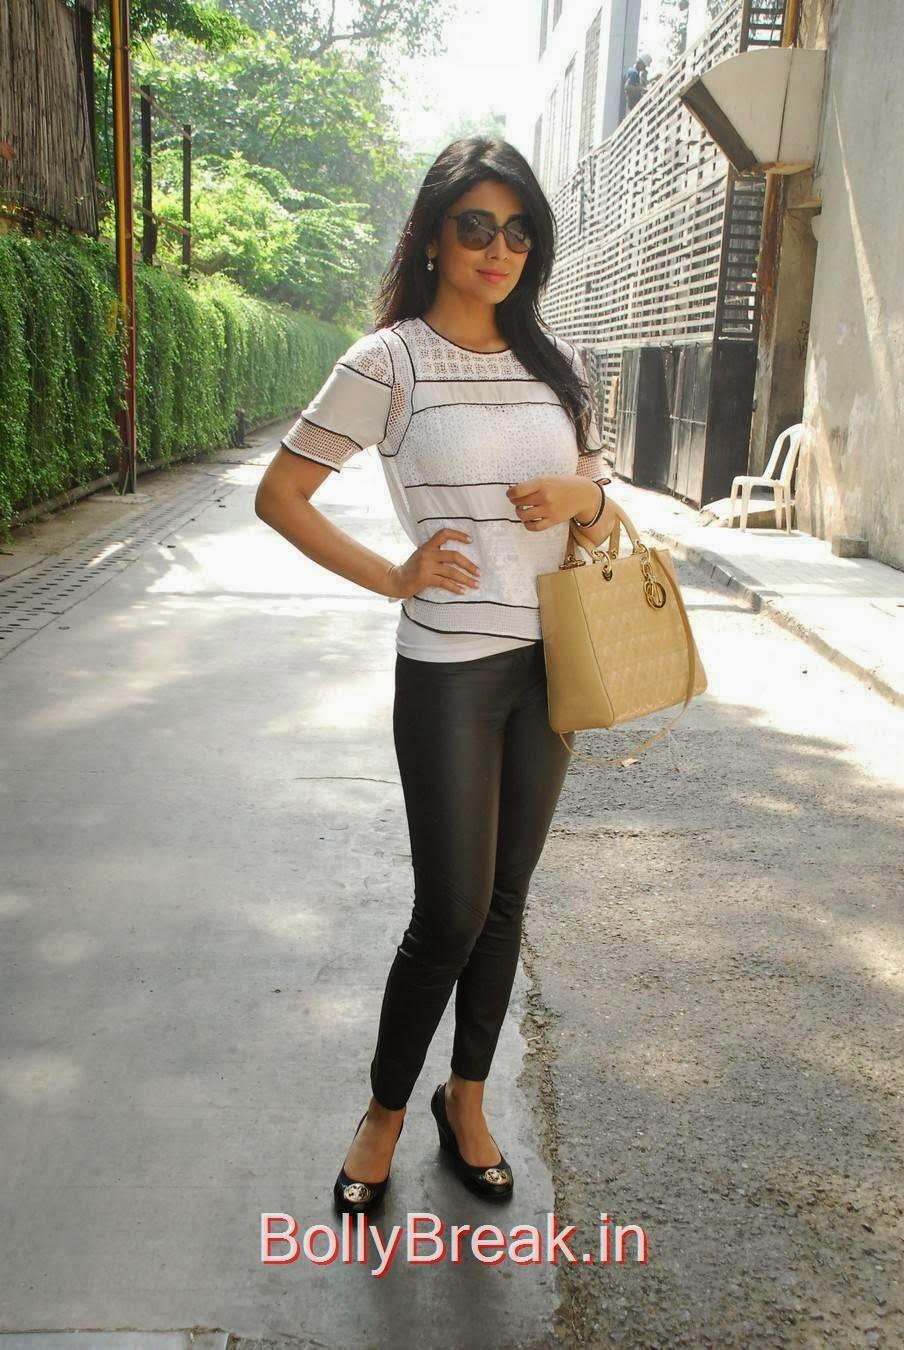 Shriya Saran Unseen Stills, Shriya Saran Hot Pics in Black Tight Leggings & Top at event